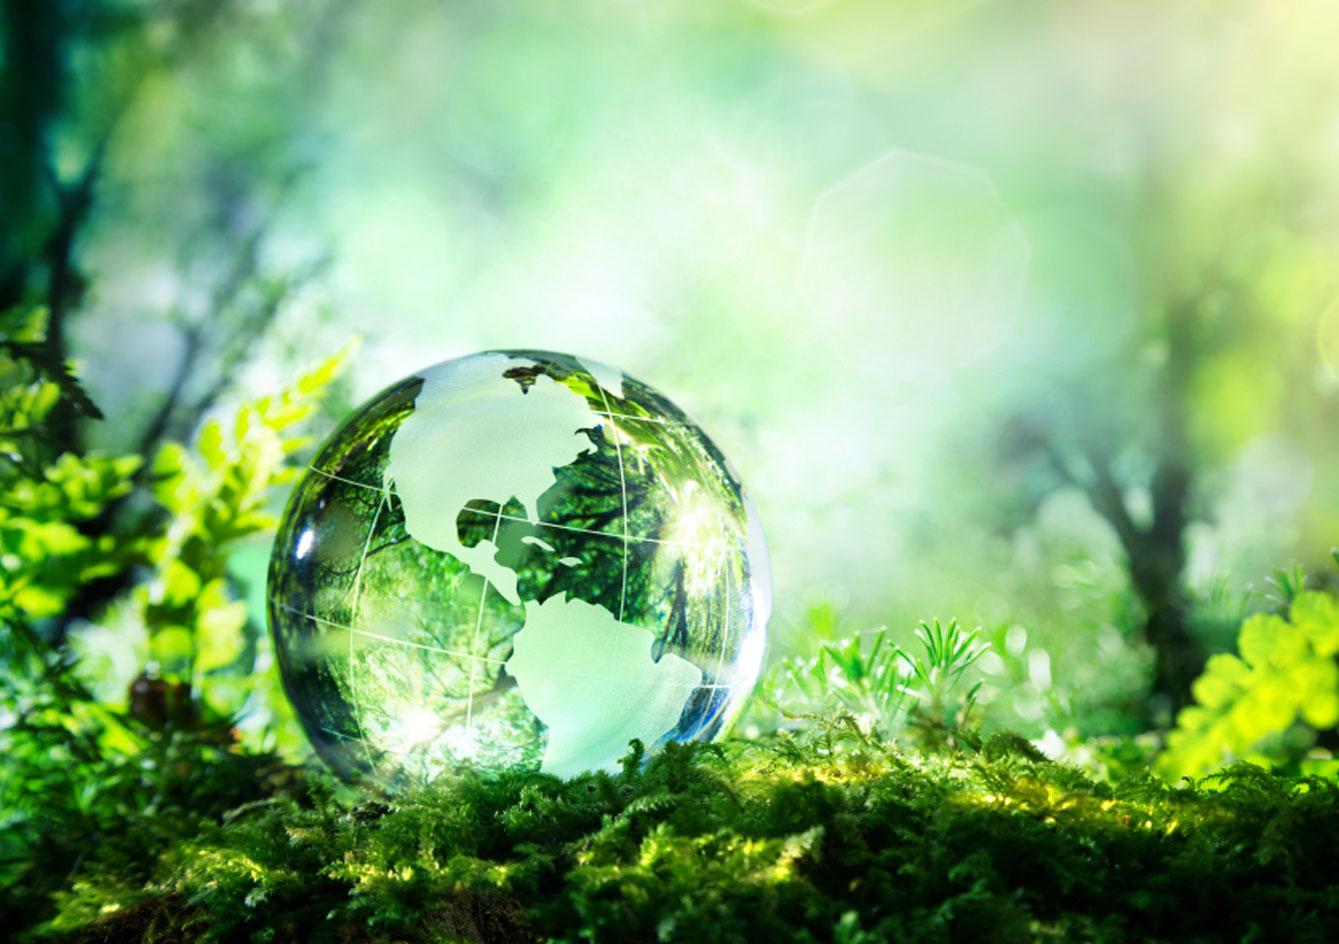 Prioritize Environmental Safety